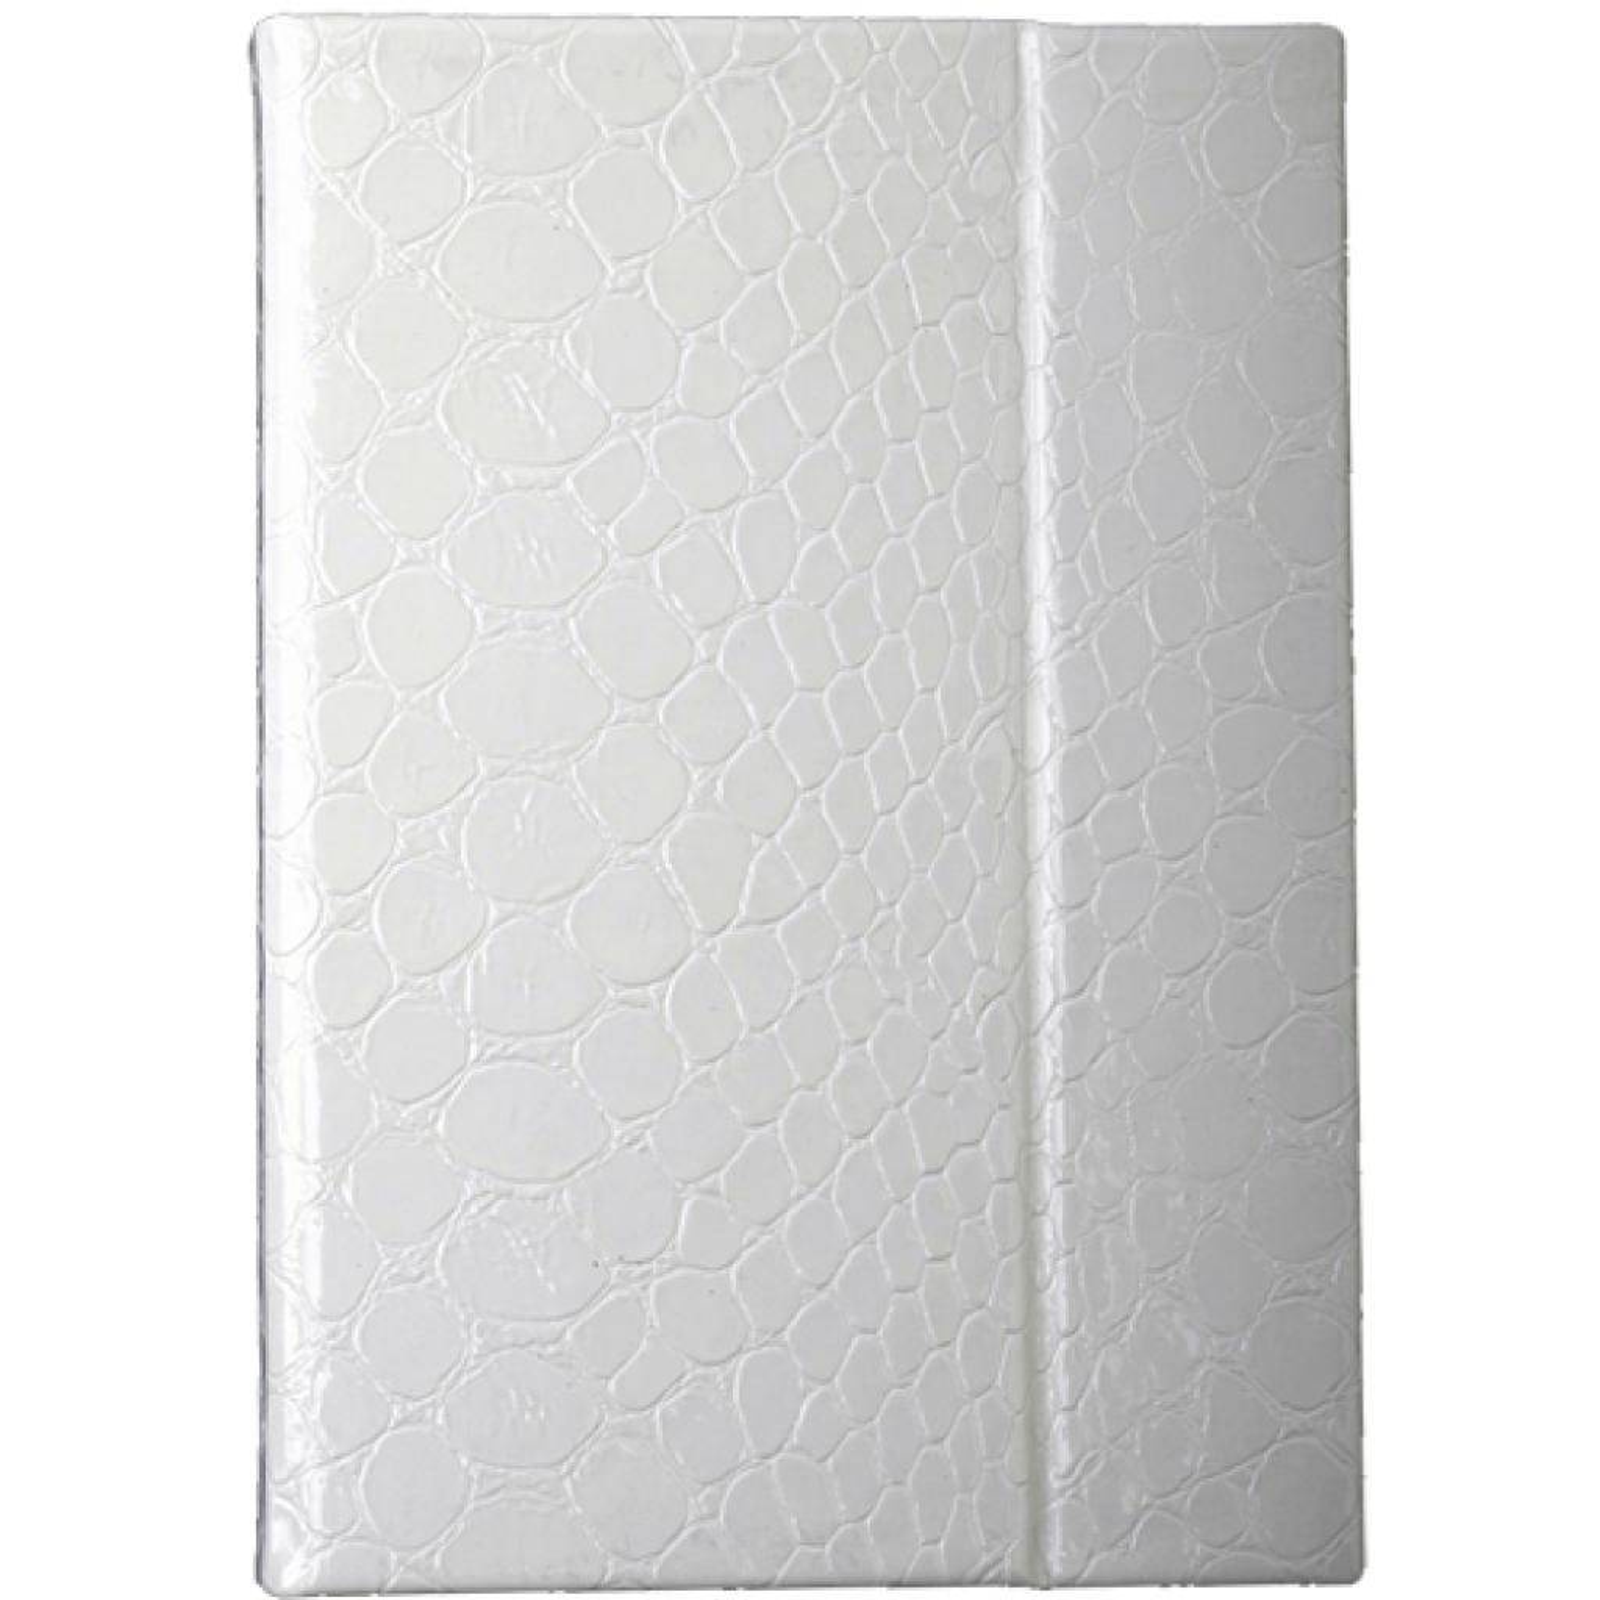 Чехол для планшета Vento 8 Desire glossy - White reptile